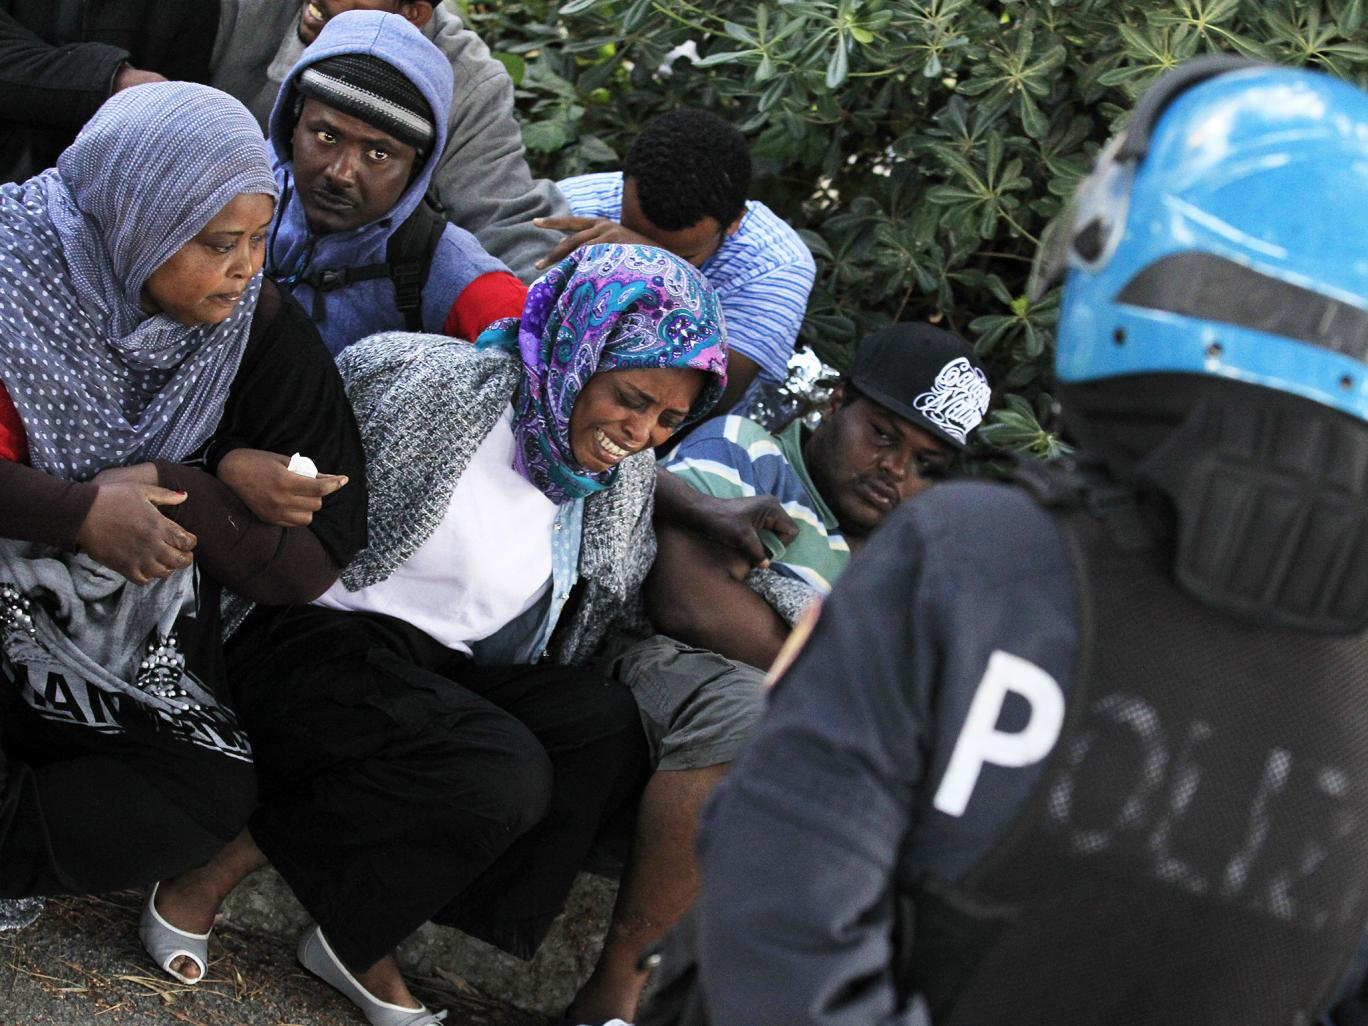 migrants stranded -italy france border June Reuters